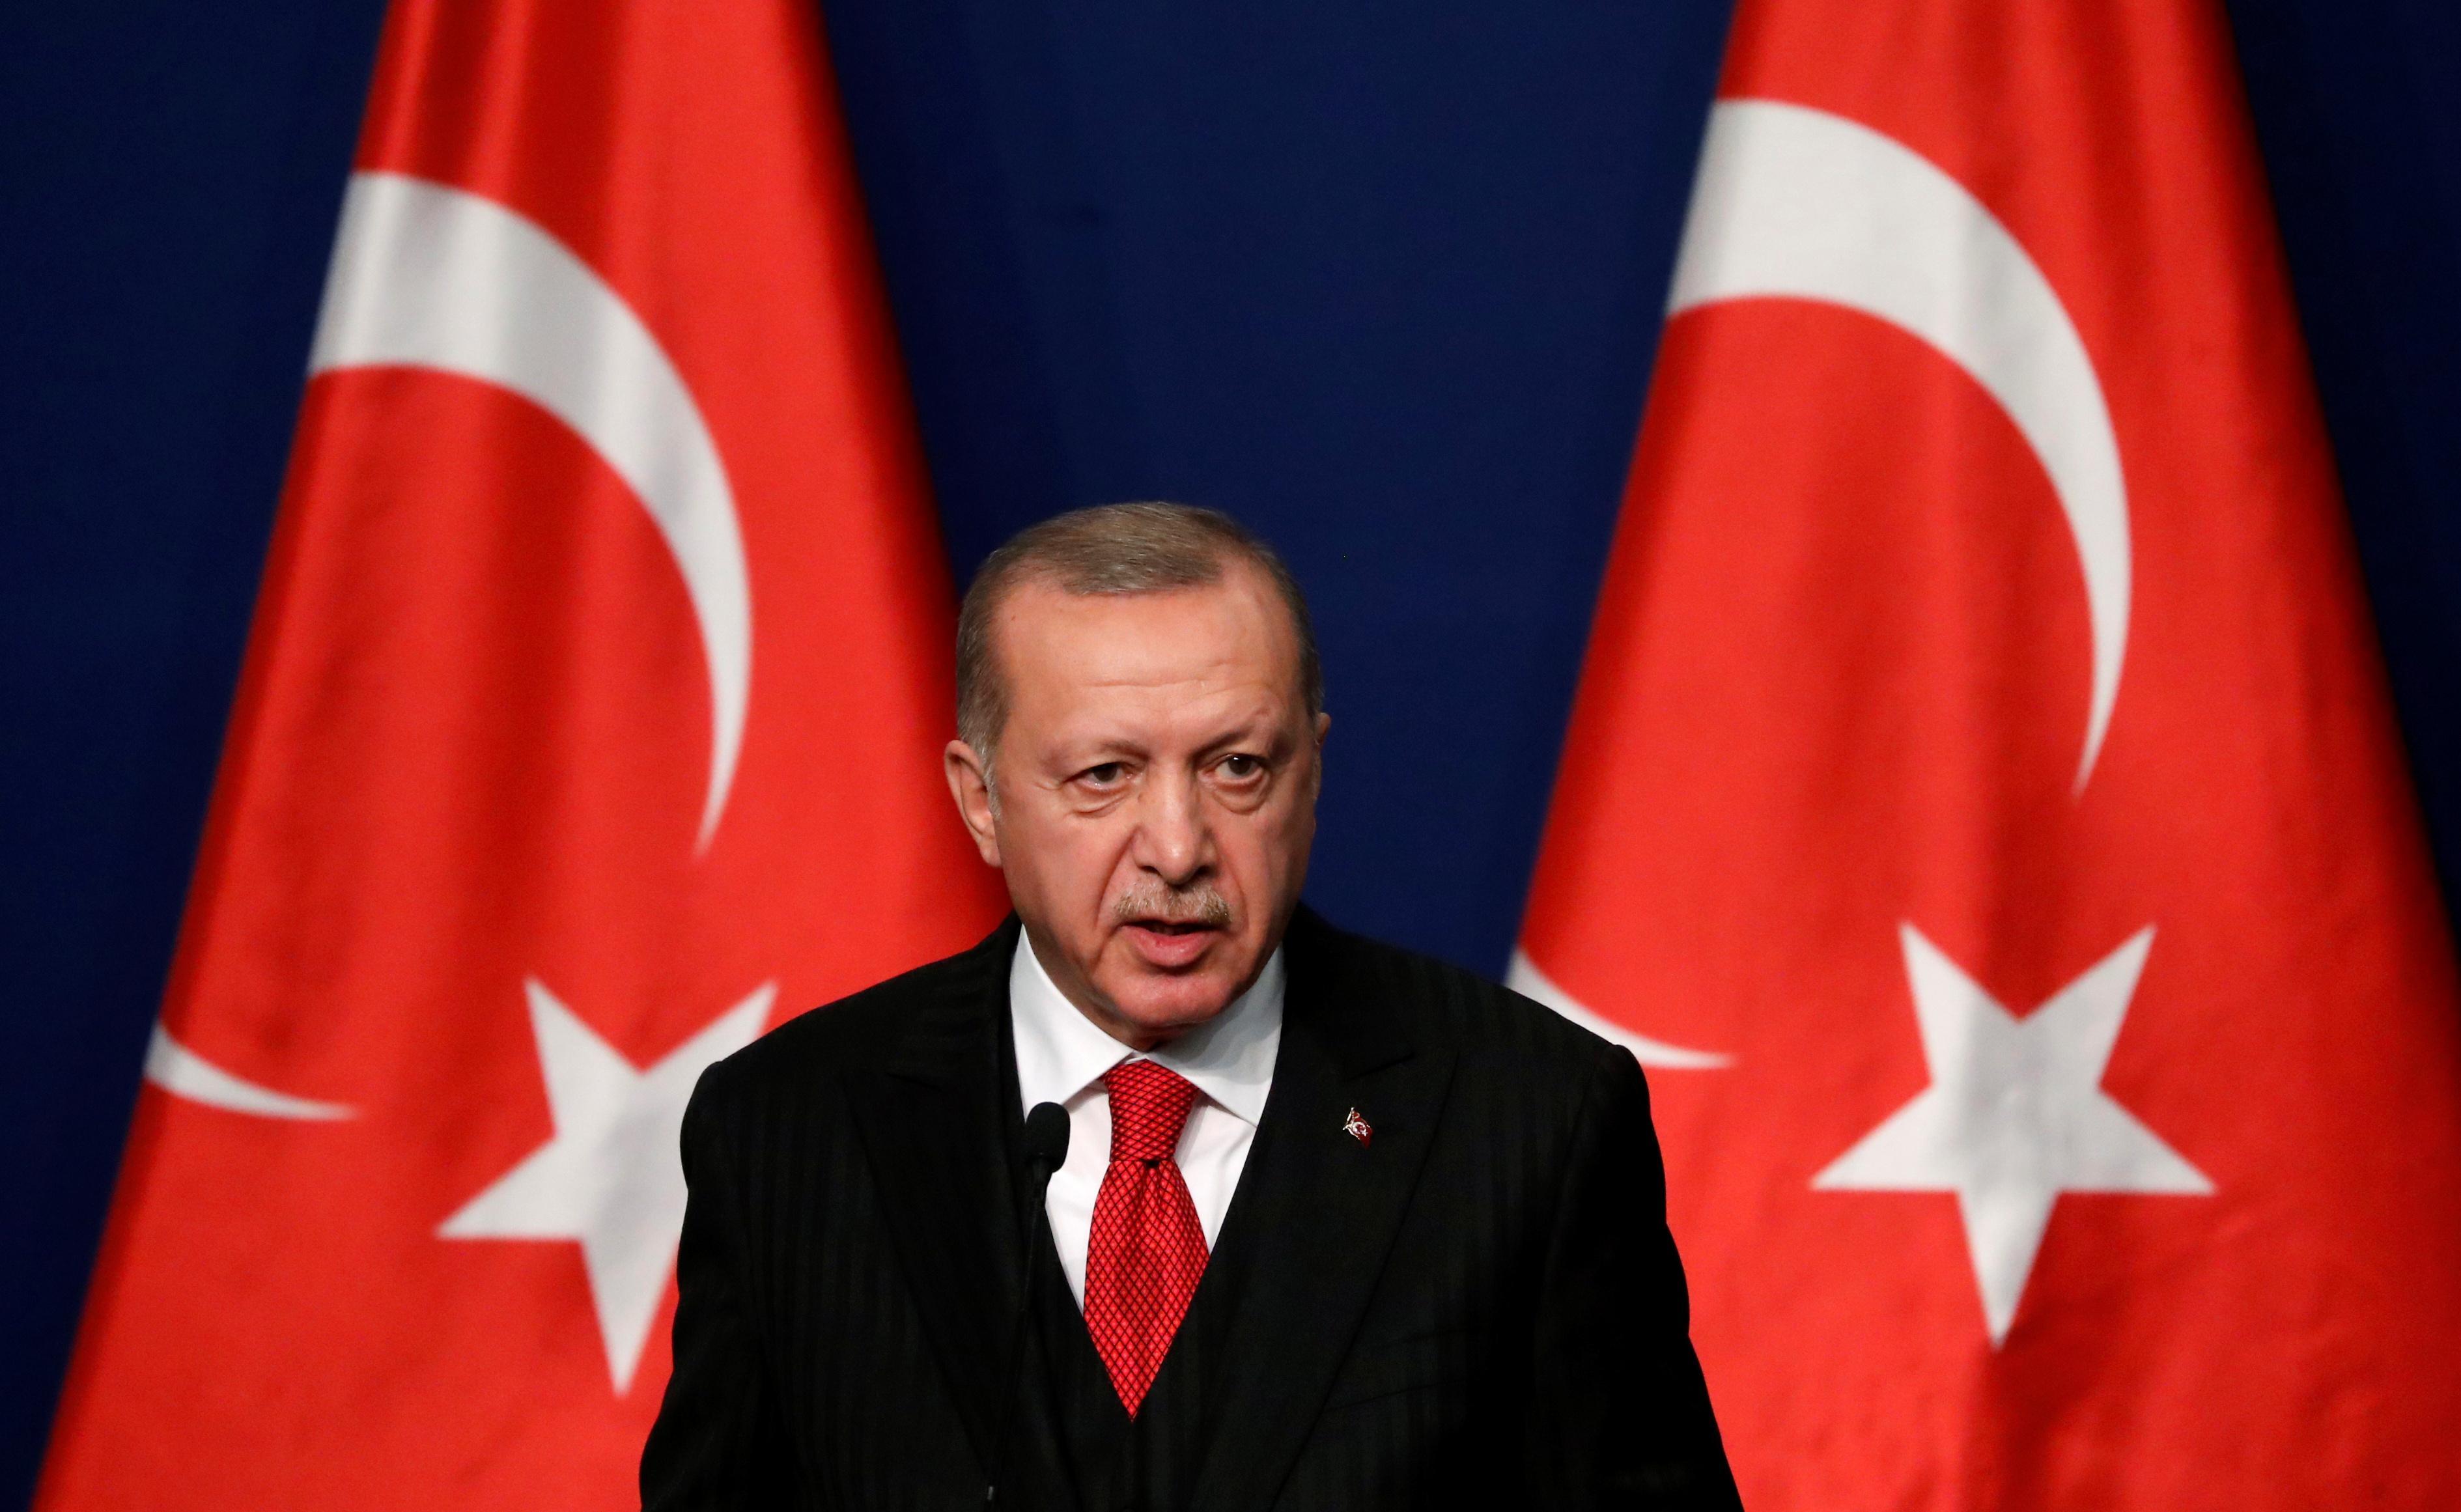 Turkey's Erdogan says will tell Trump U.S. failed to keep Syria...